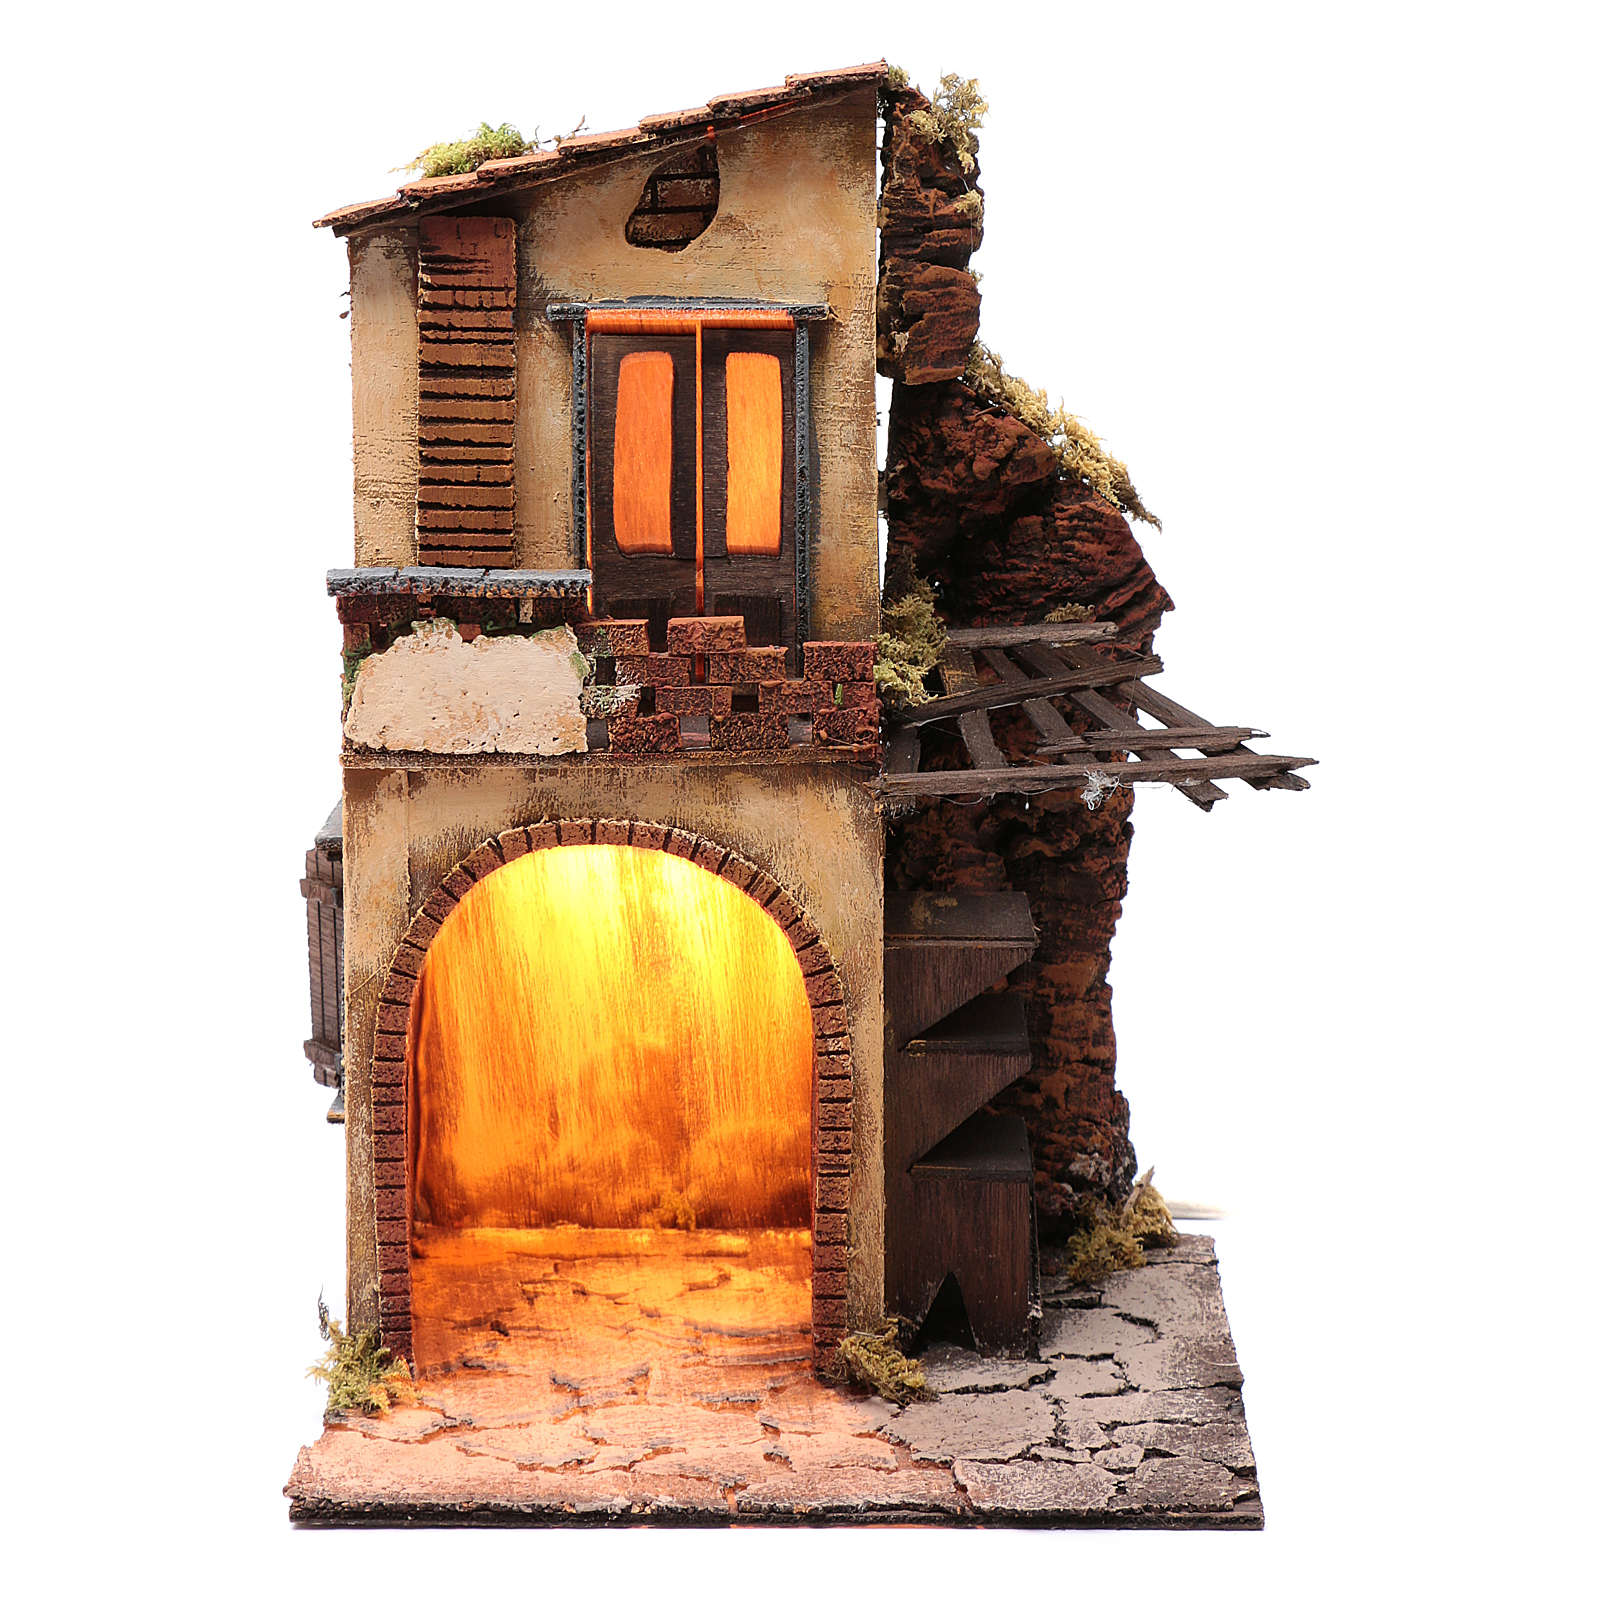 Casa Balcone E Capanna E Tettoia 40x25x25 Cm Presepe Napoli Ebay